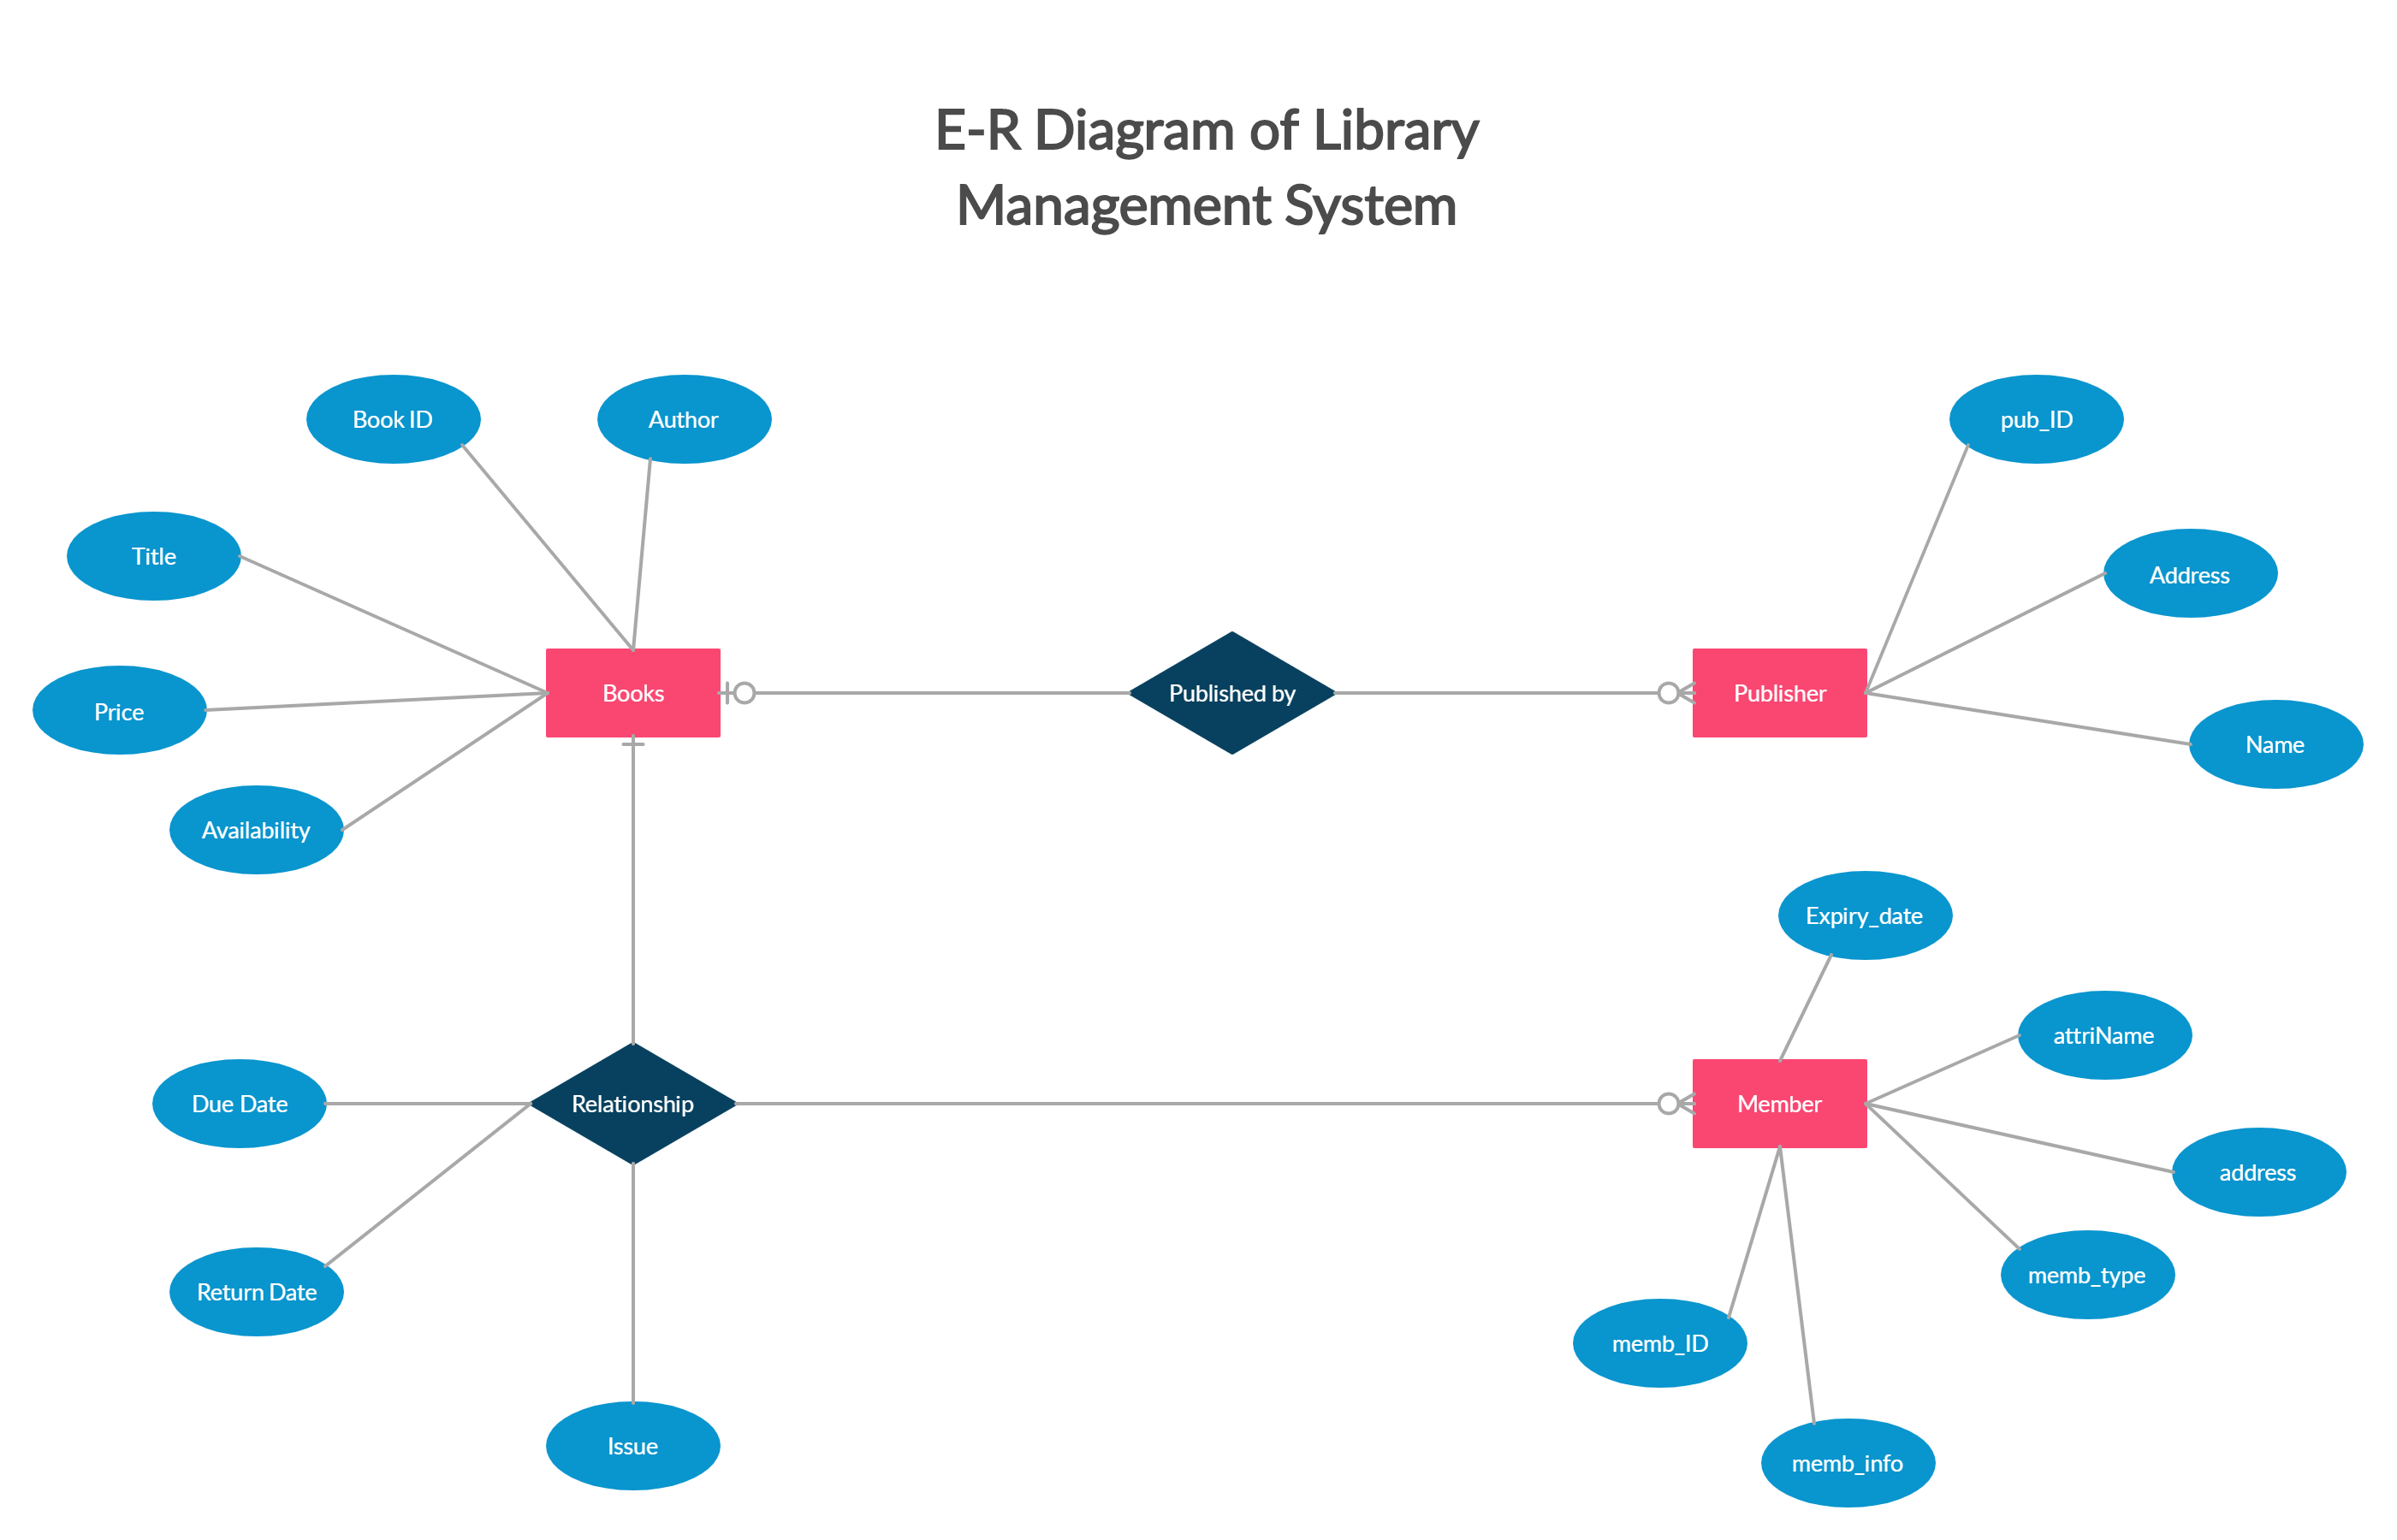 Library Management System | Relationship Diagram, Diagram